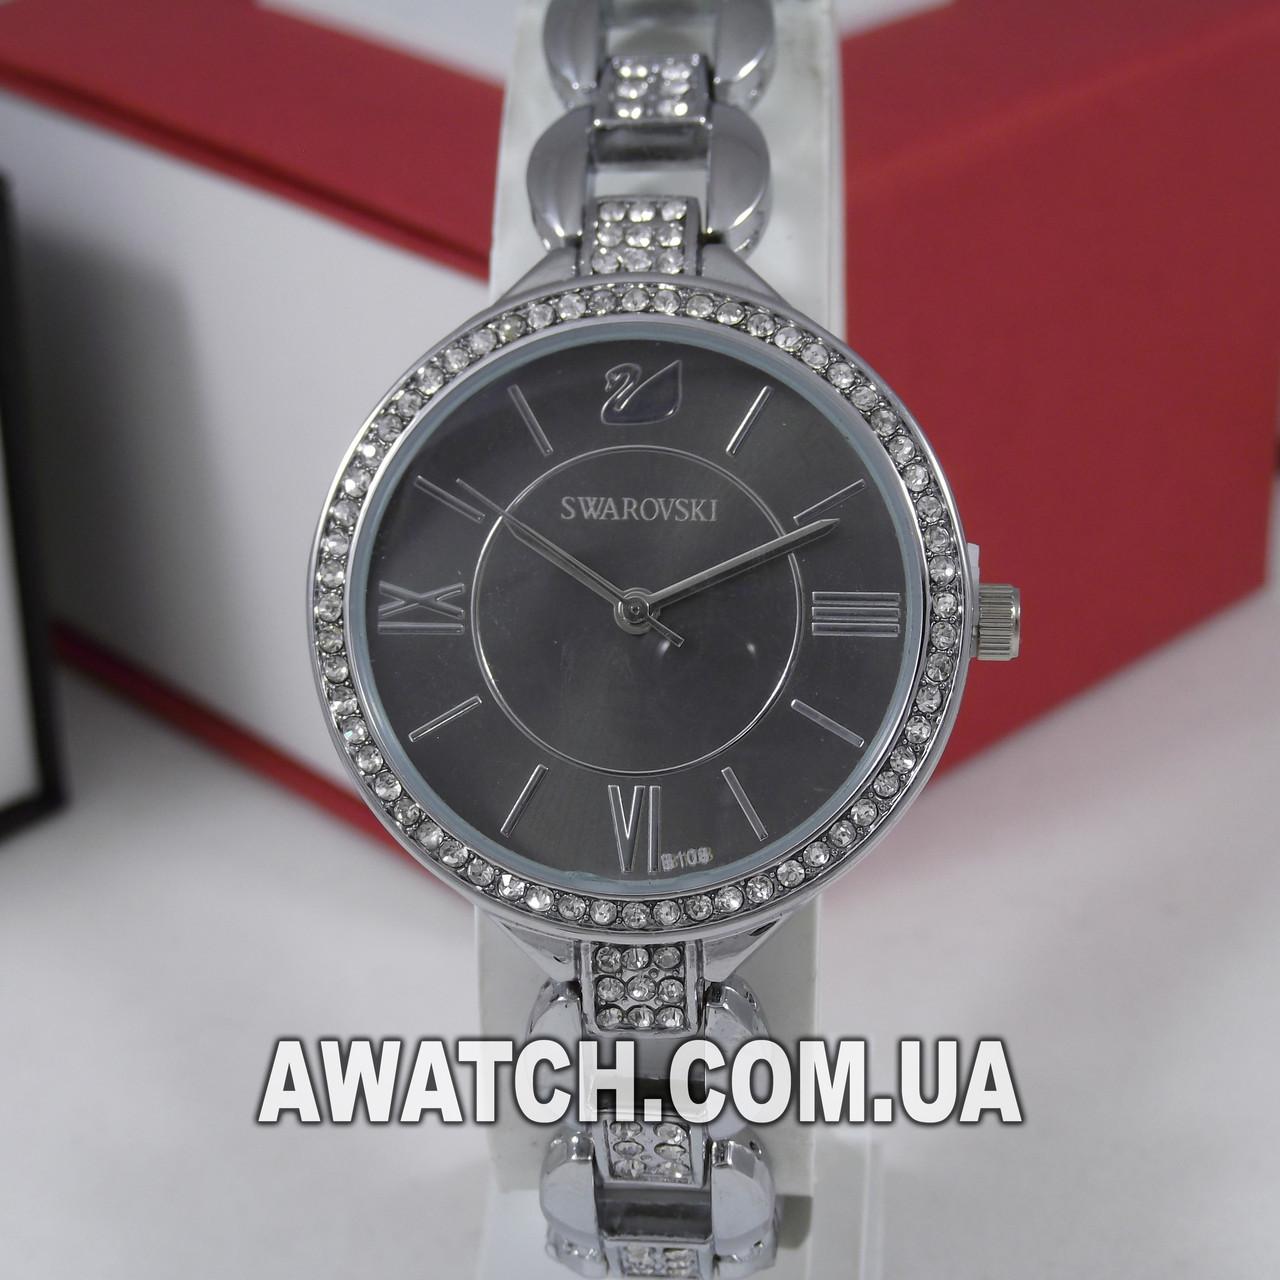 9f2db48a Женские кварцевые наручные часы Swarovski B108 - Интернет-магазин AWATCH в  Харькове